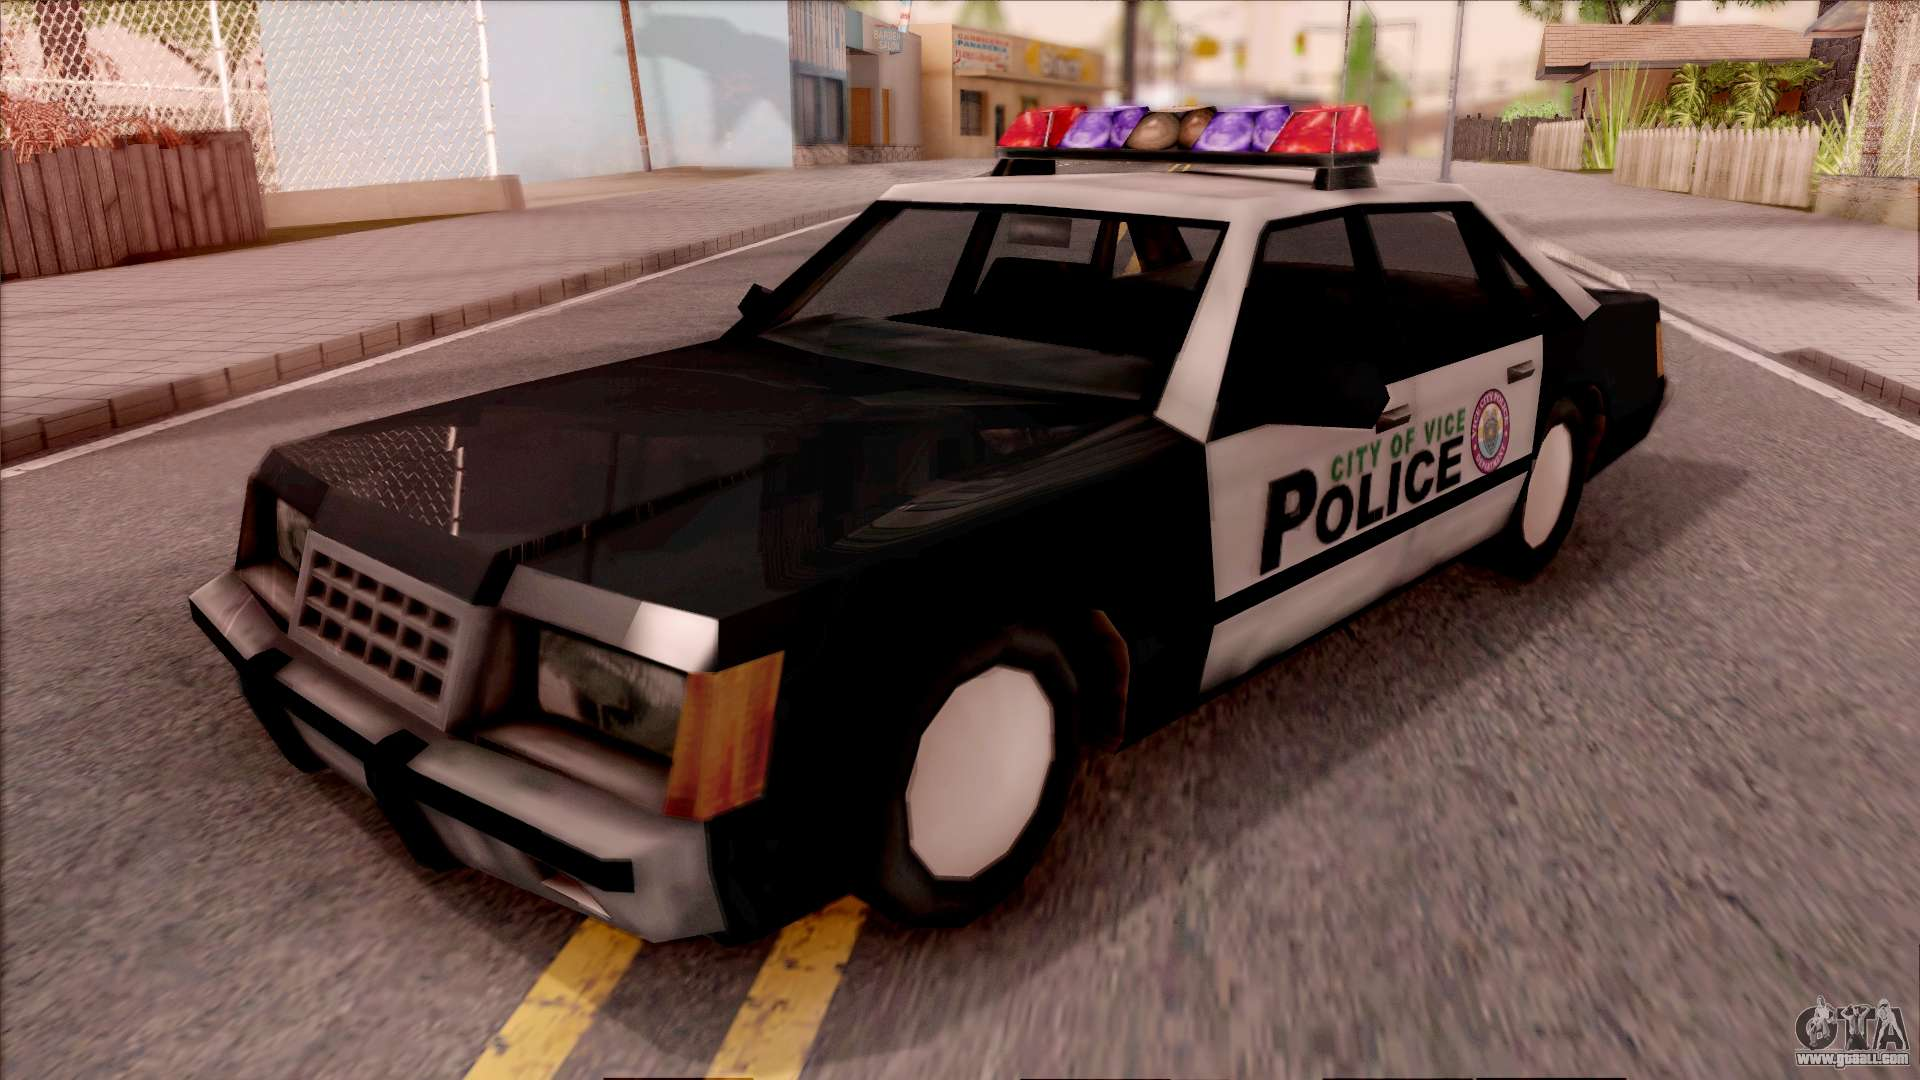 Vice City Police Car for GTA San Andreas